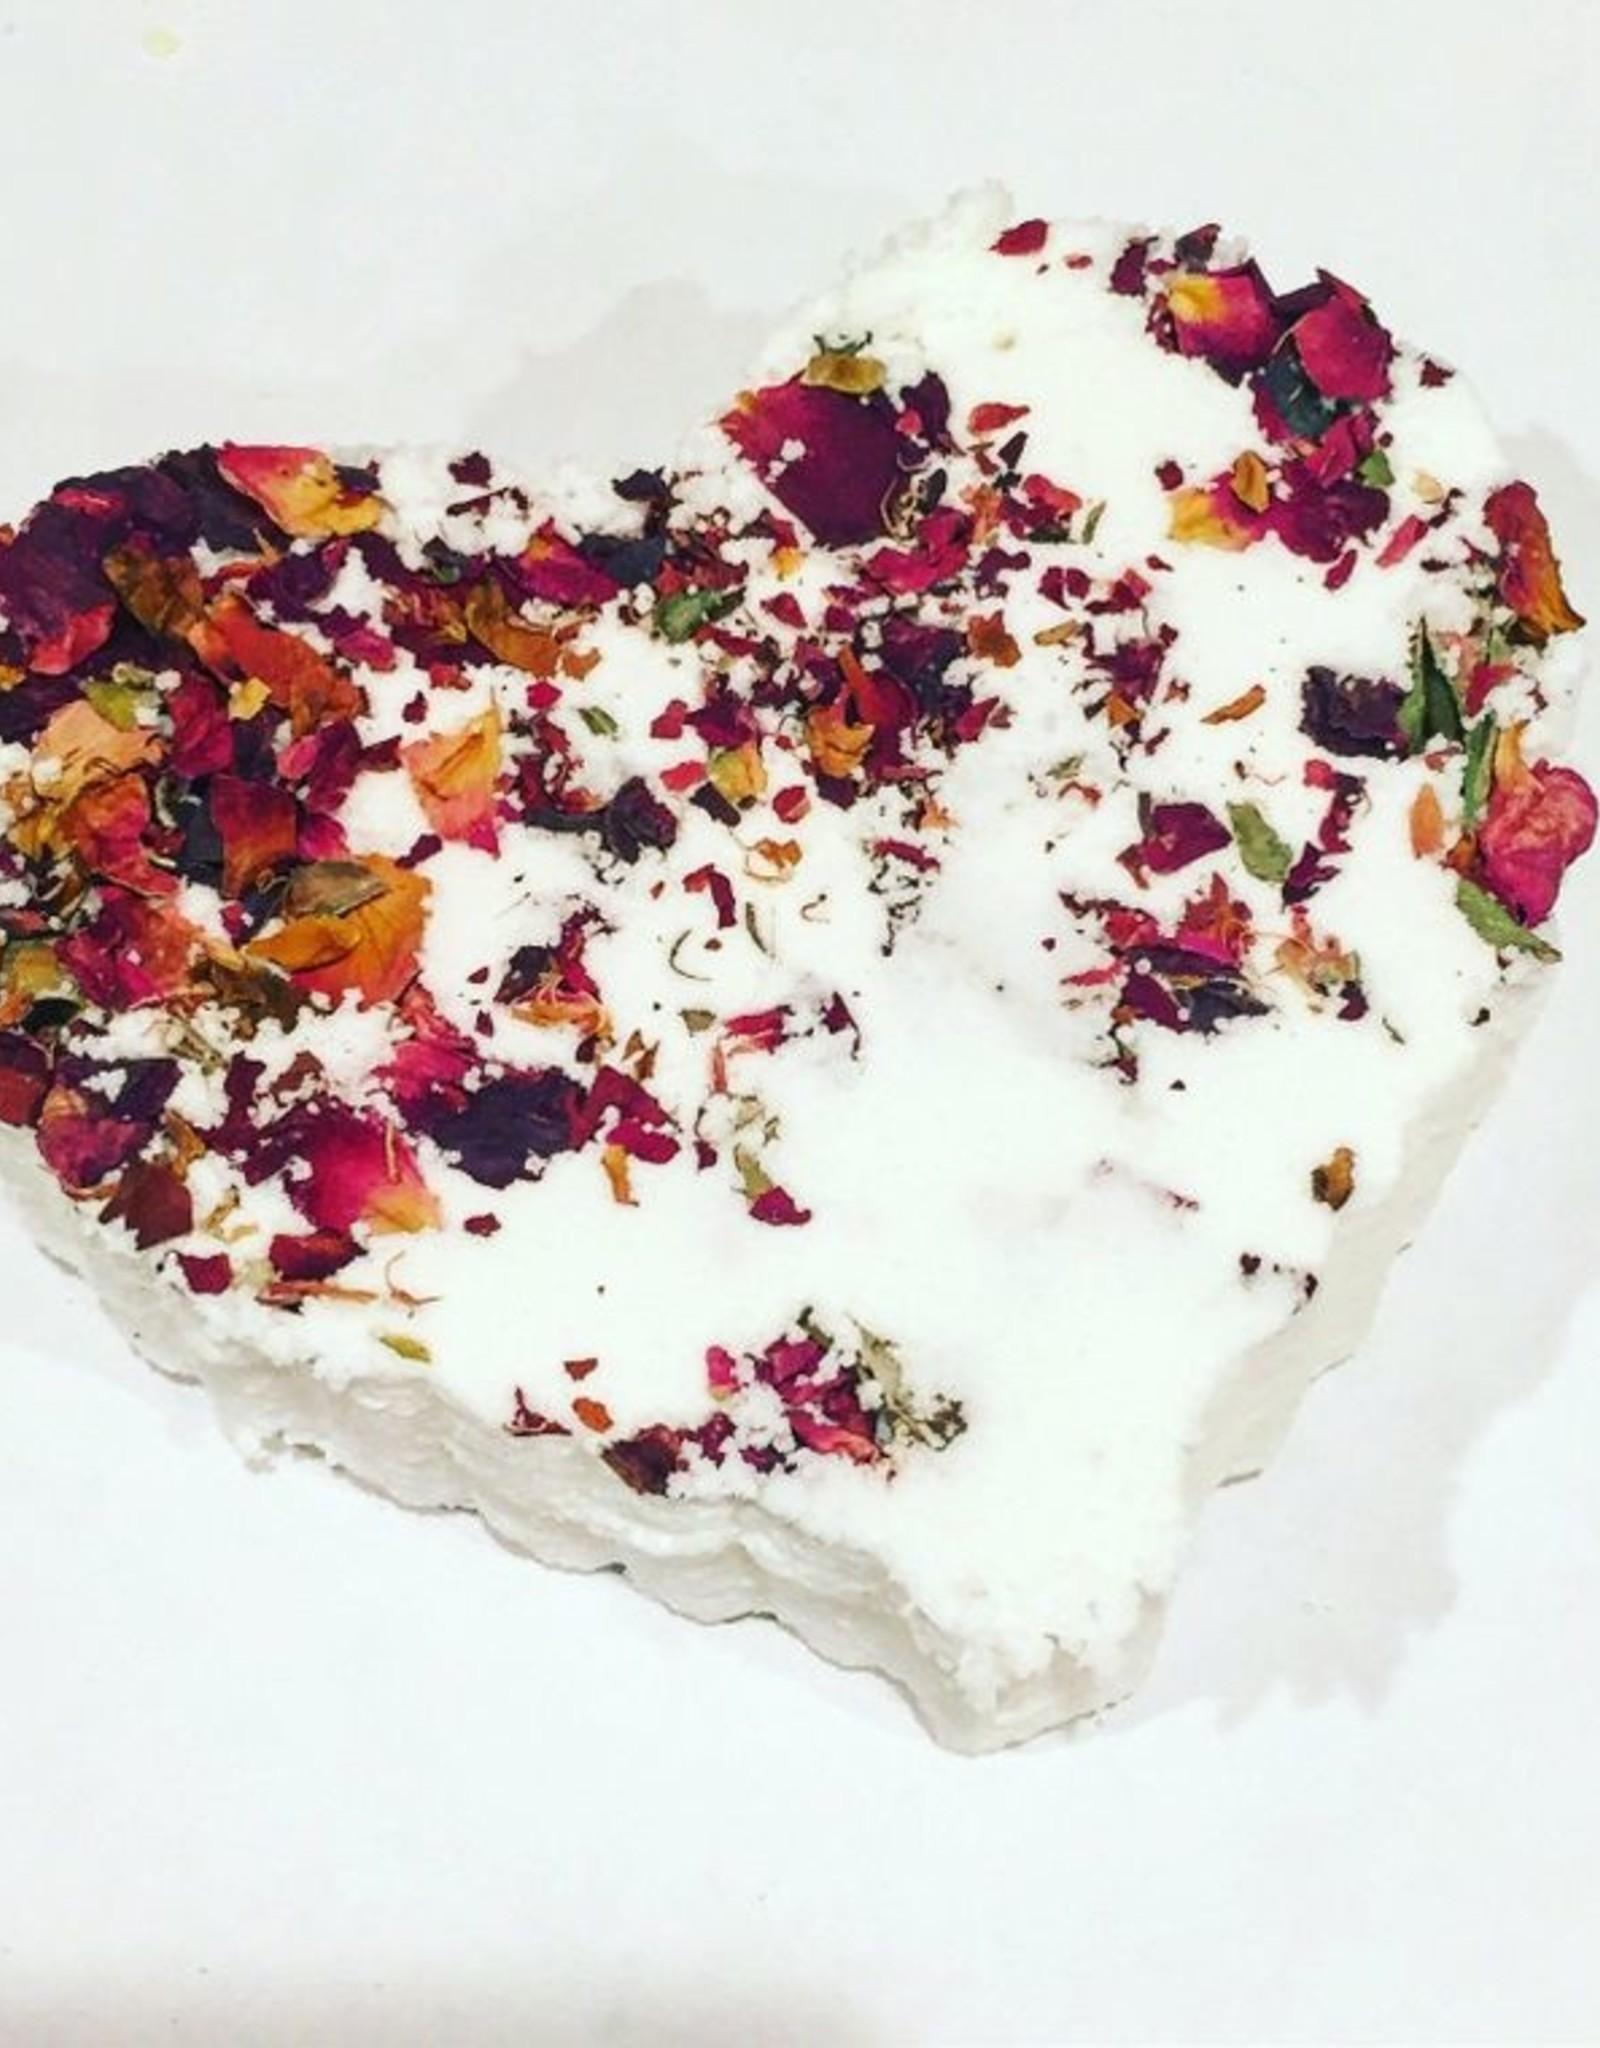 Butter Me Up Organics (DC) Rose Heart bath bomb